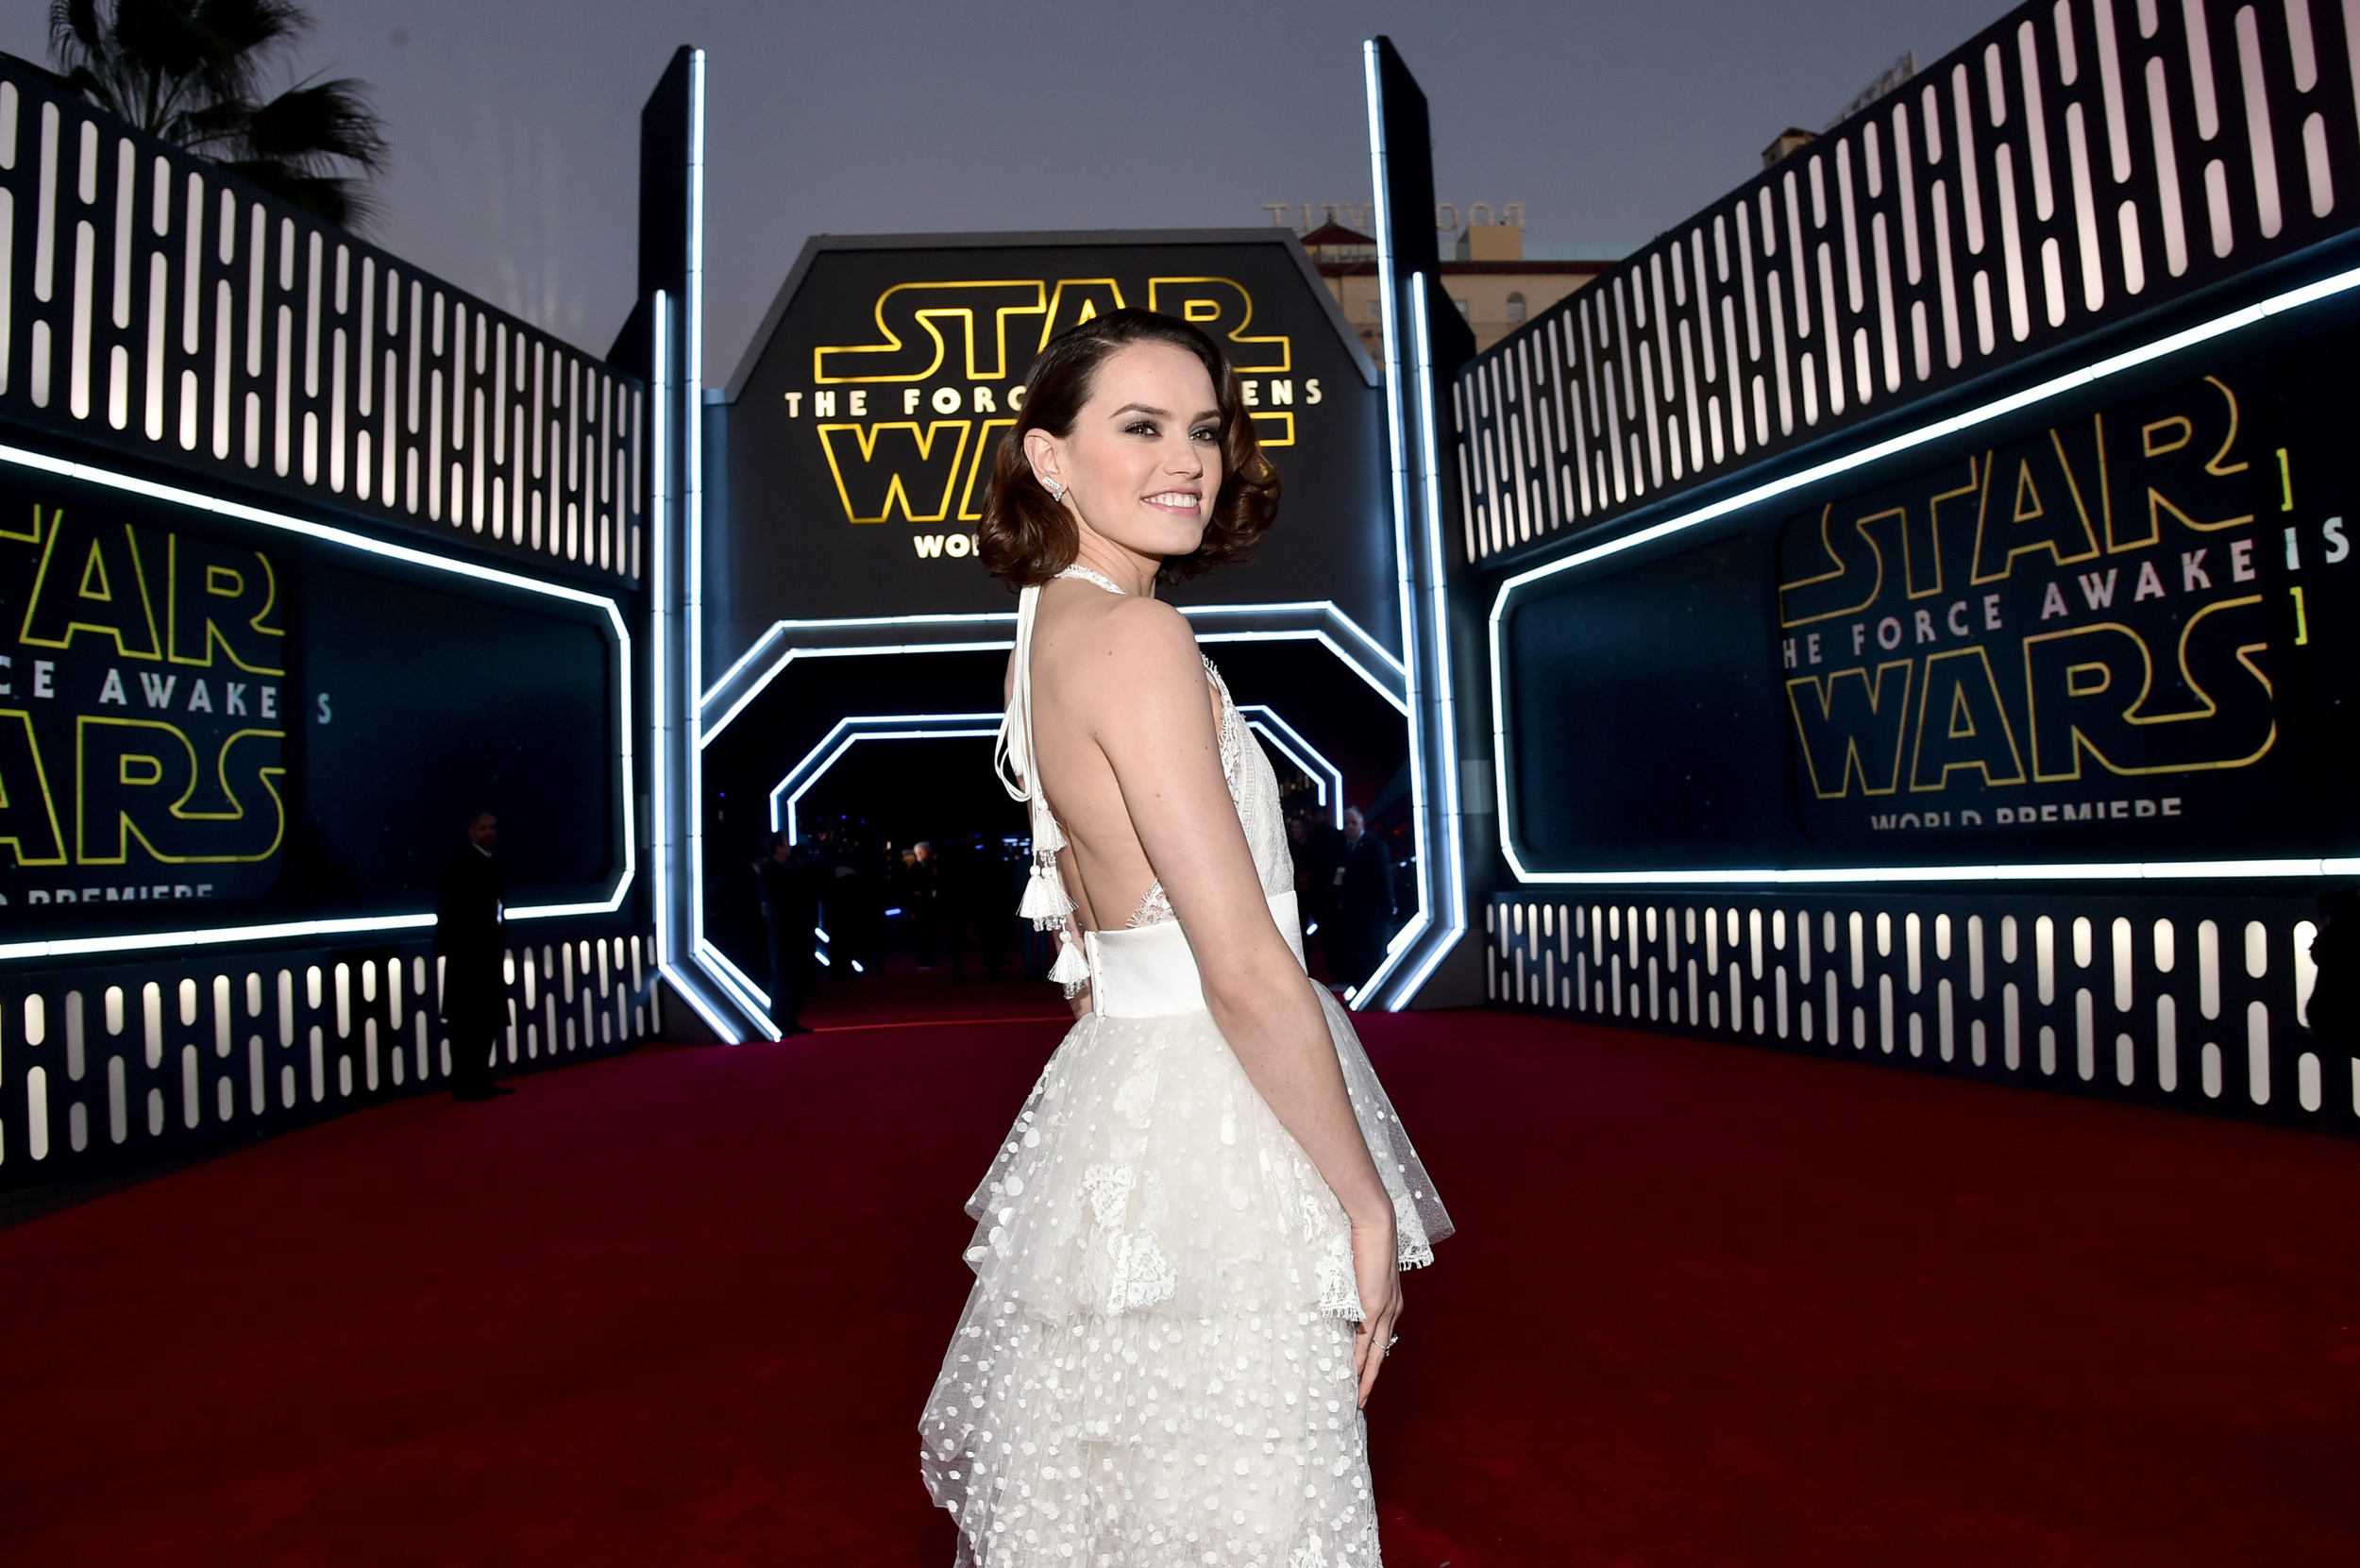 Star Wars The Force Awakens World Premiere